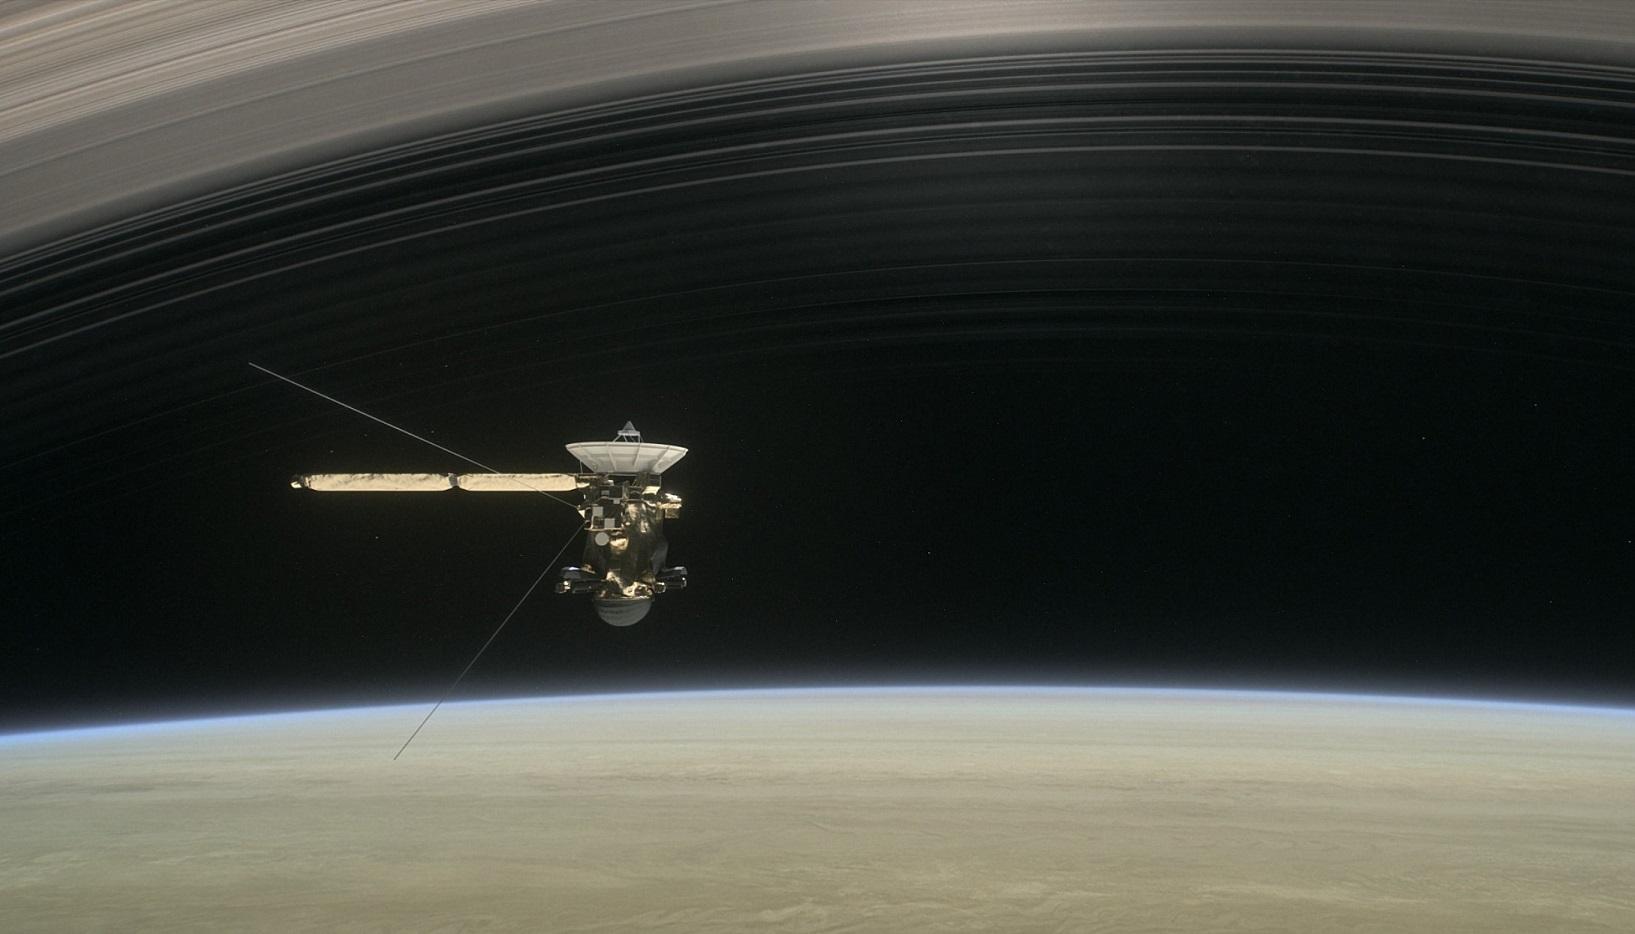 artist's concept of Cassini passing inside Saturn's rings